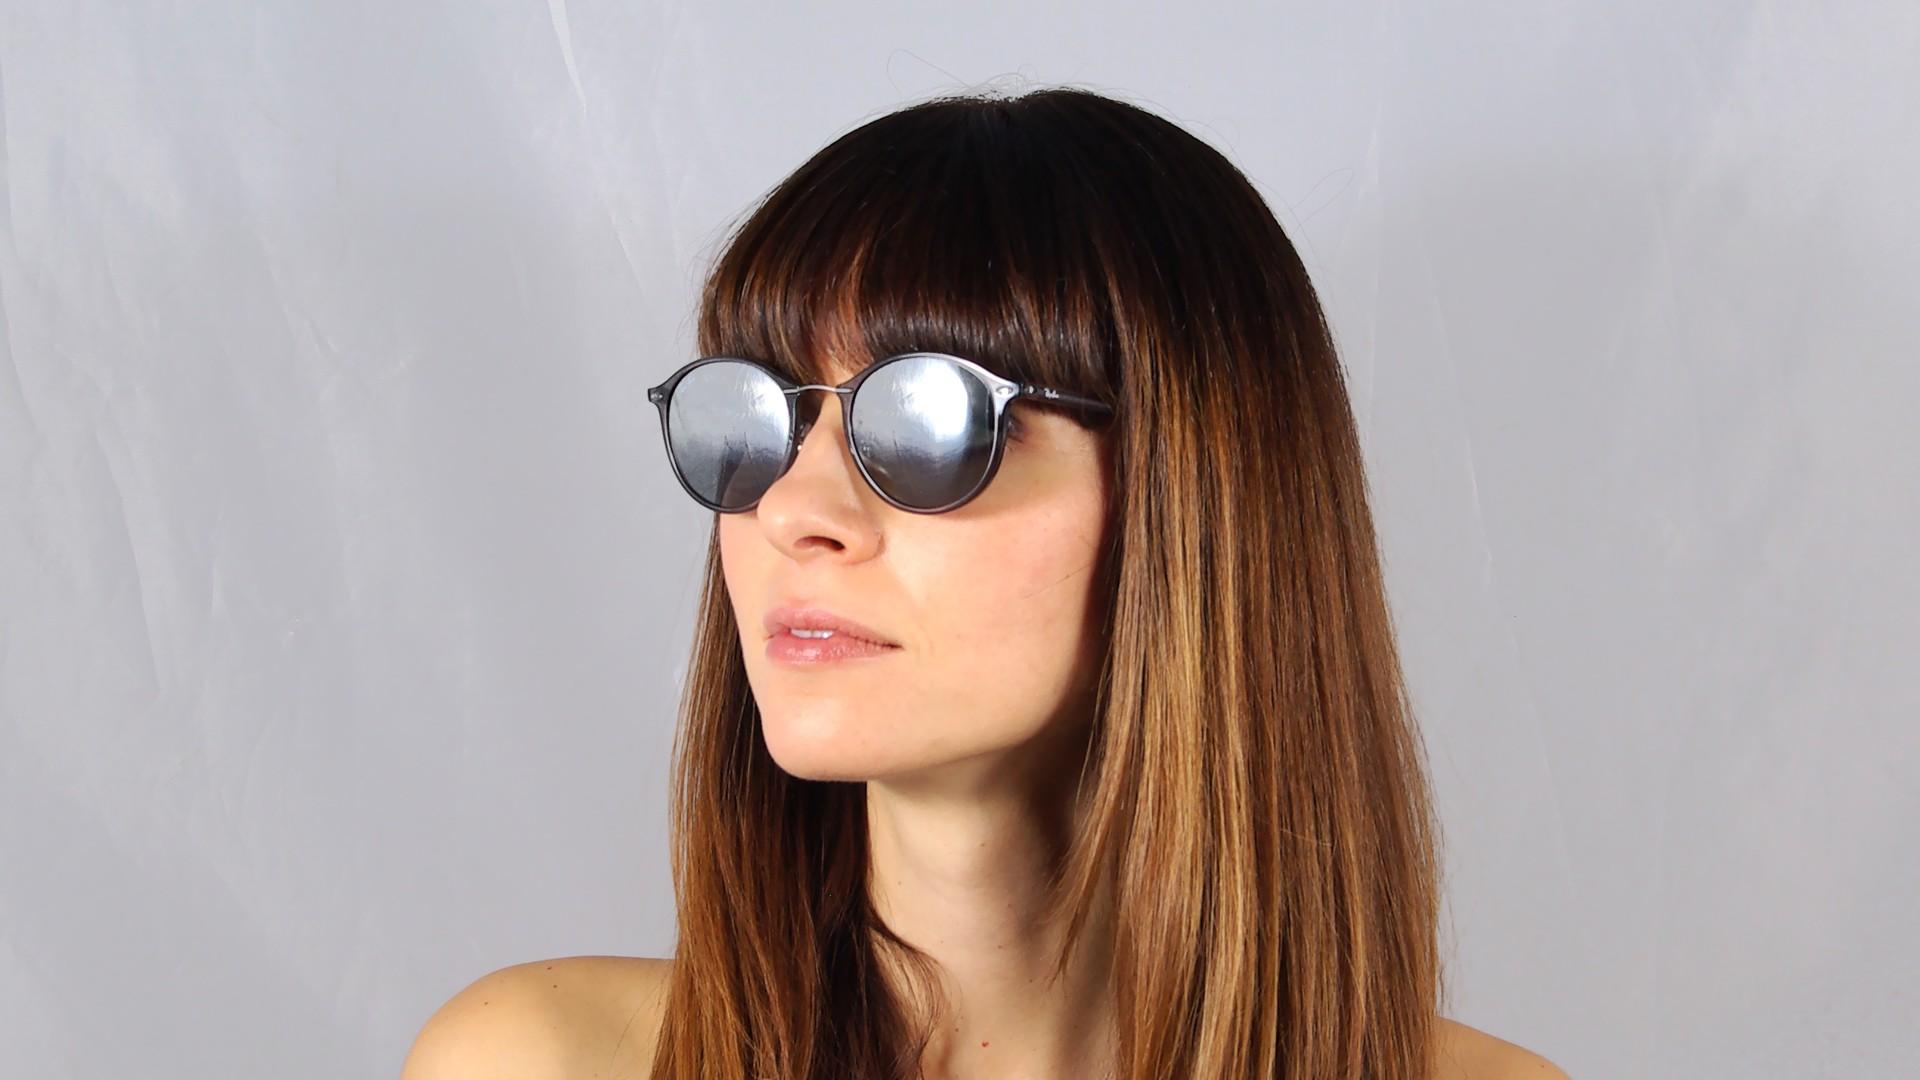 aa0c6bbb677 Sunglasses Ray-Ban Tech Light Ray Tech Grey RB4242 620088 49-21 Medium  Mirror